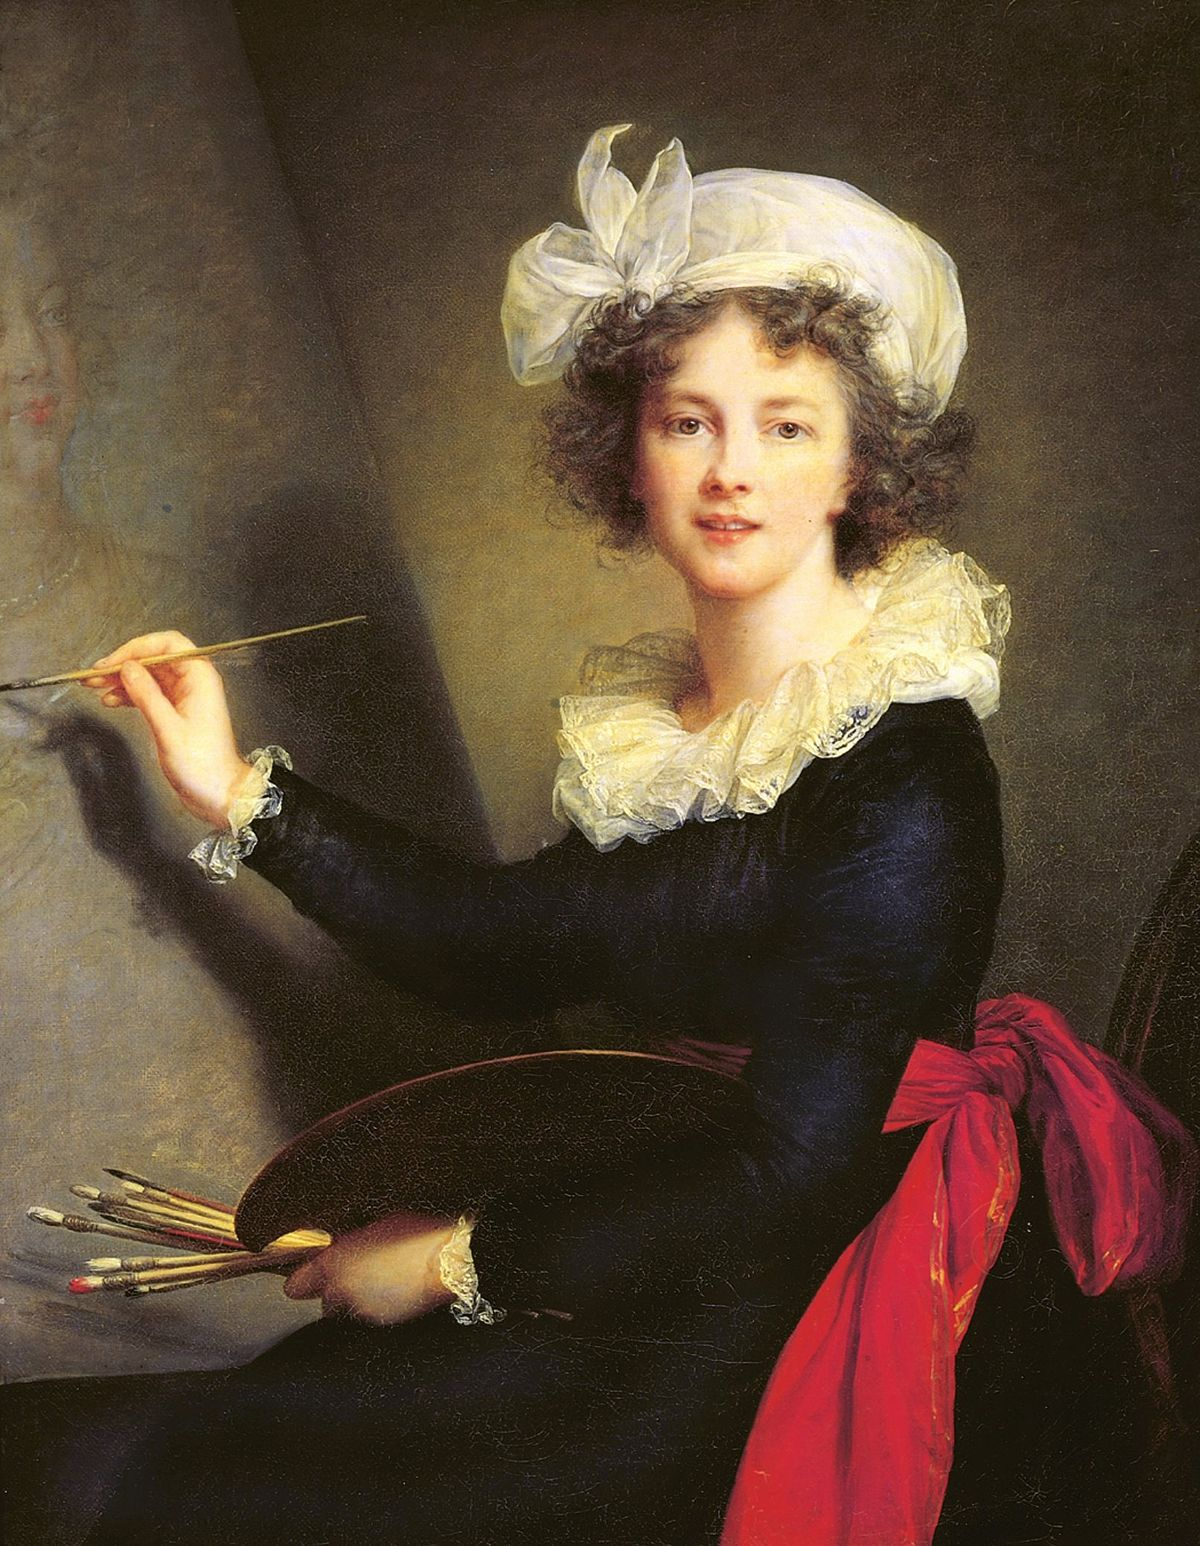 Élisabeth Vigée Le Brun - Wikipedia